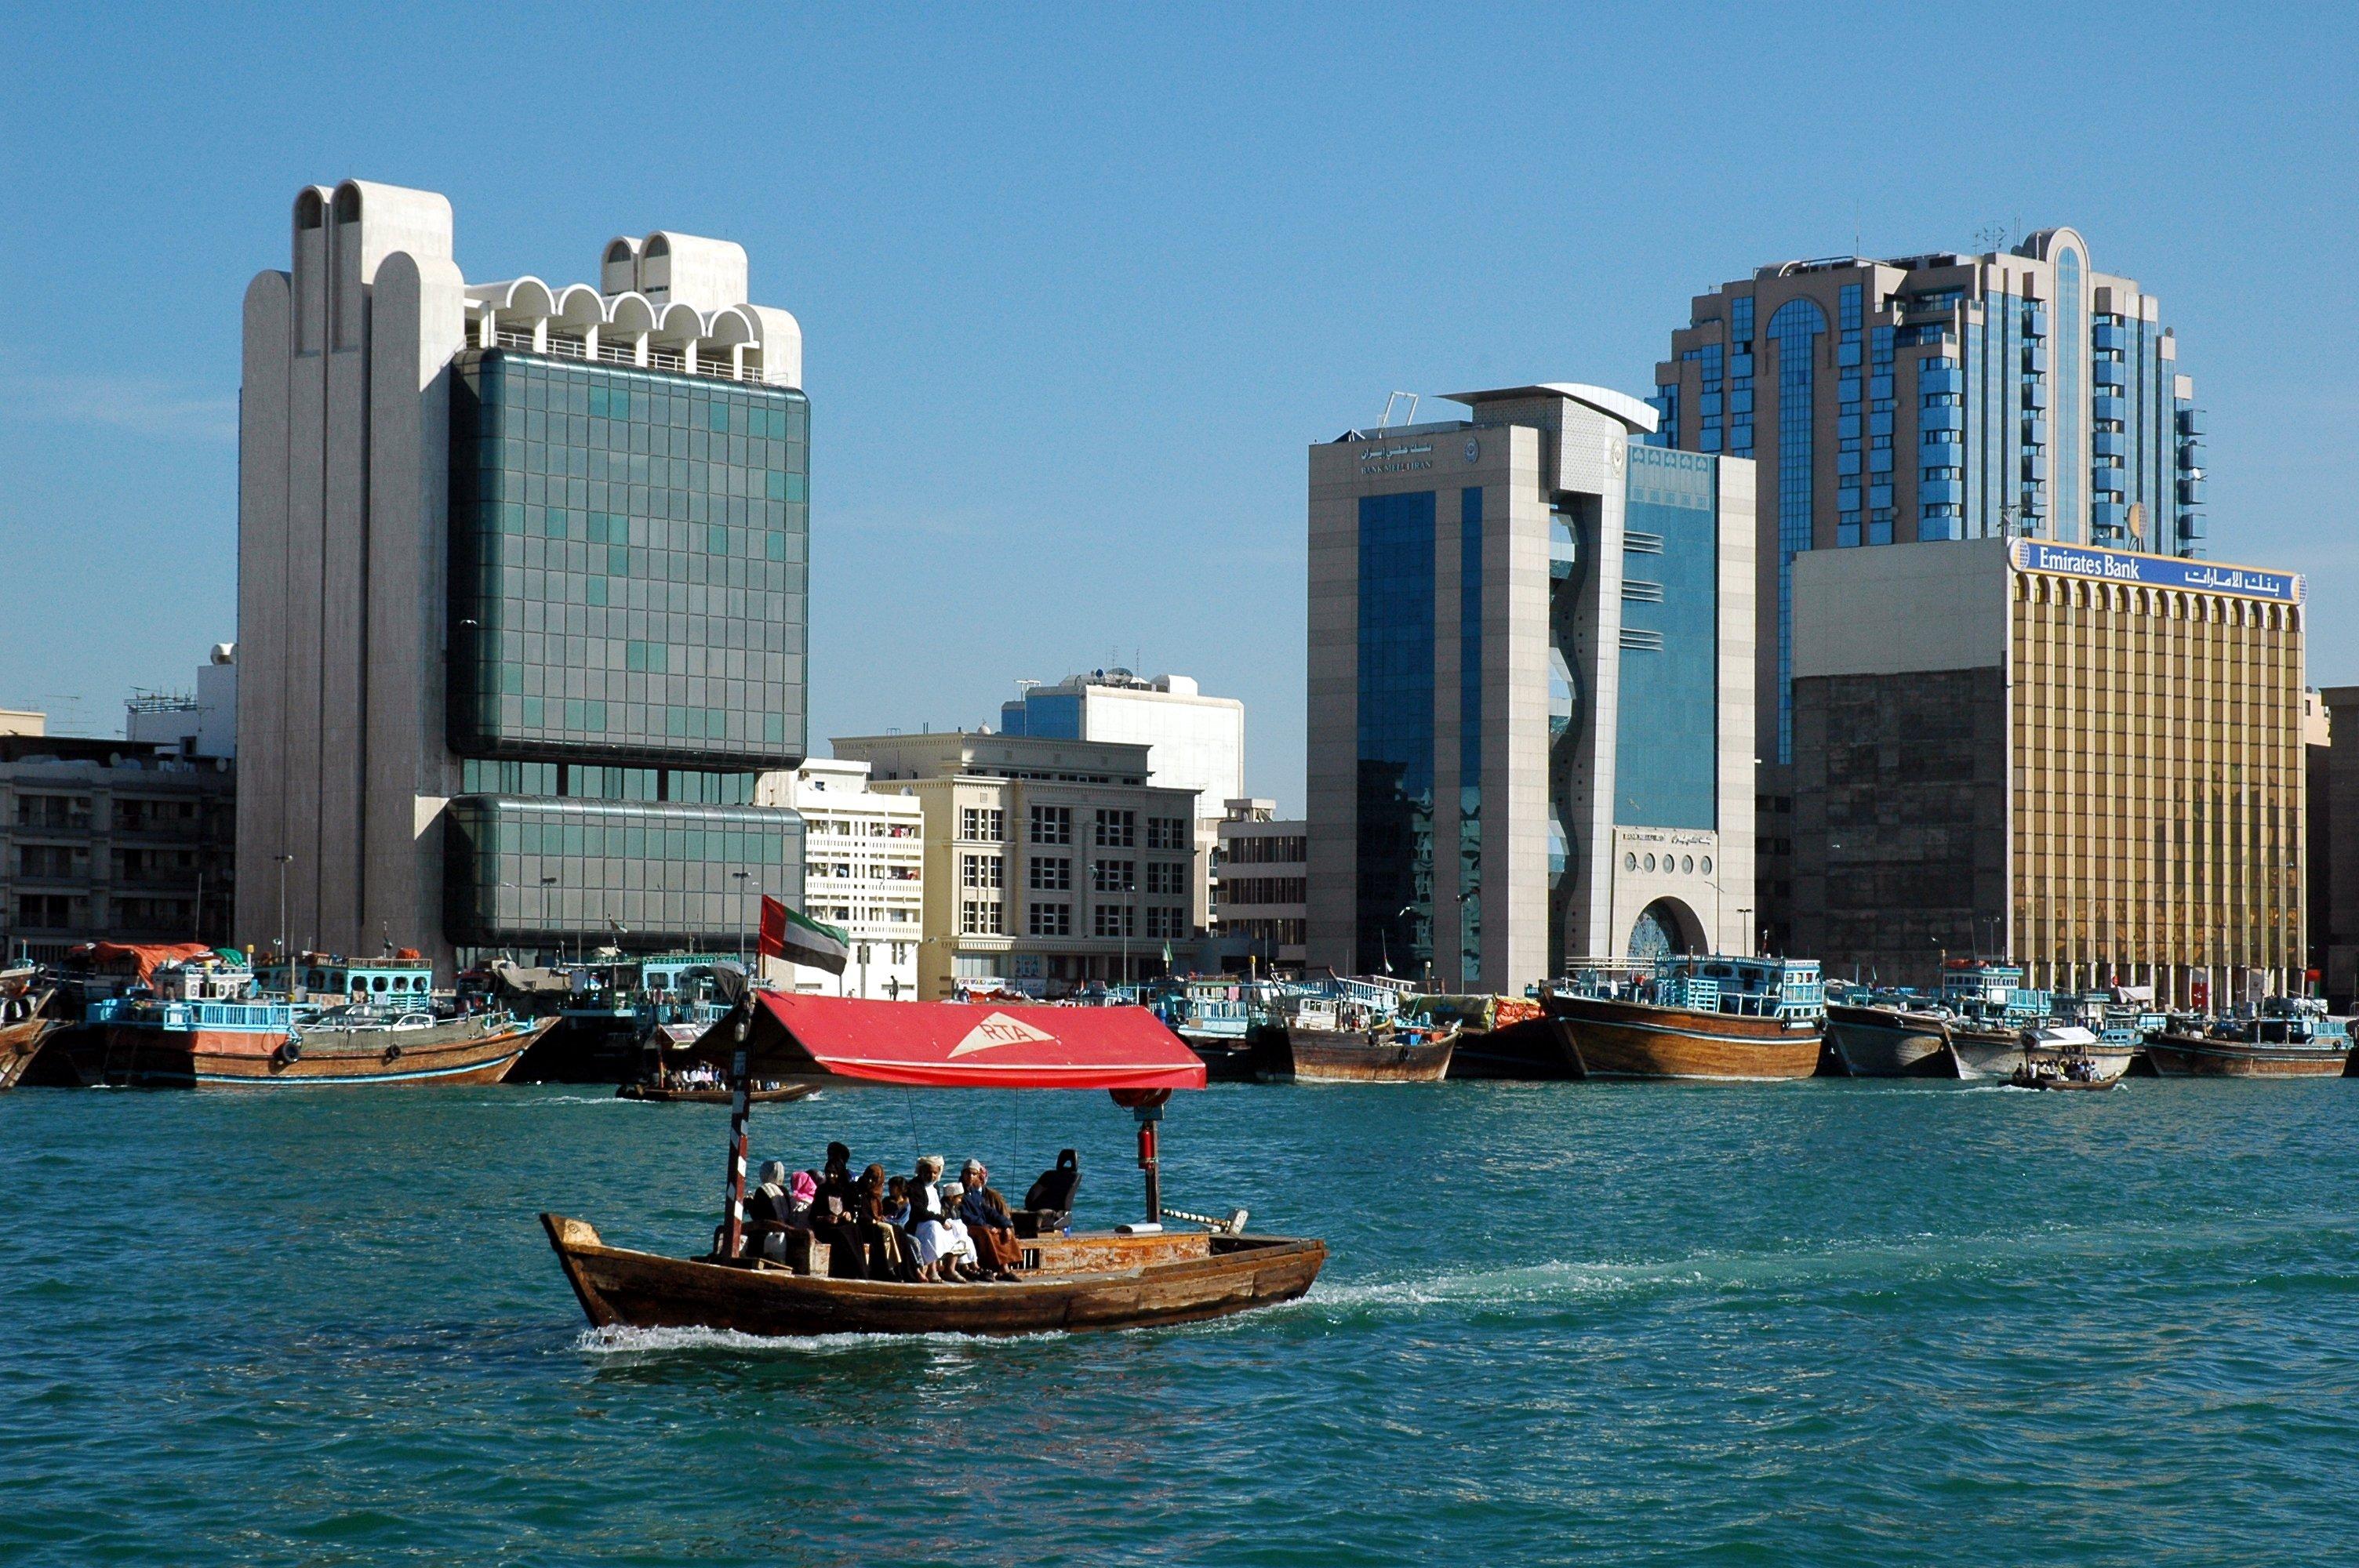 Ihram Kids For Sale Dubai: Dubai Honeymoon Tour Packages